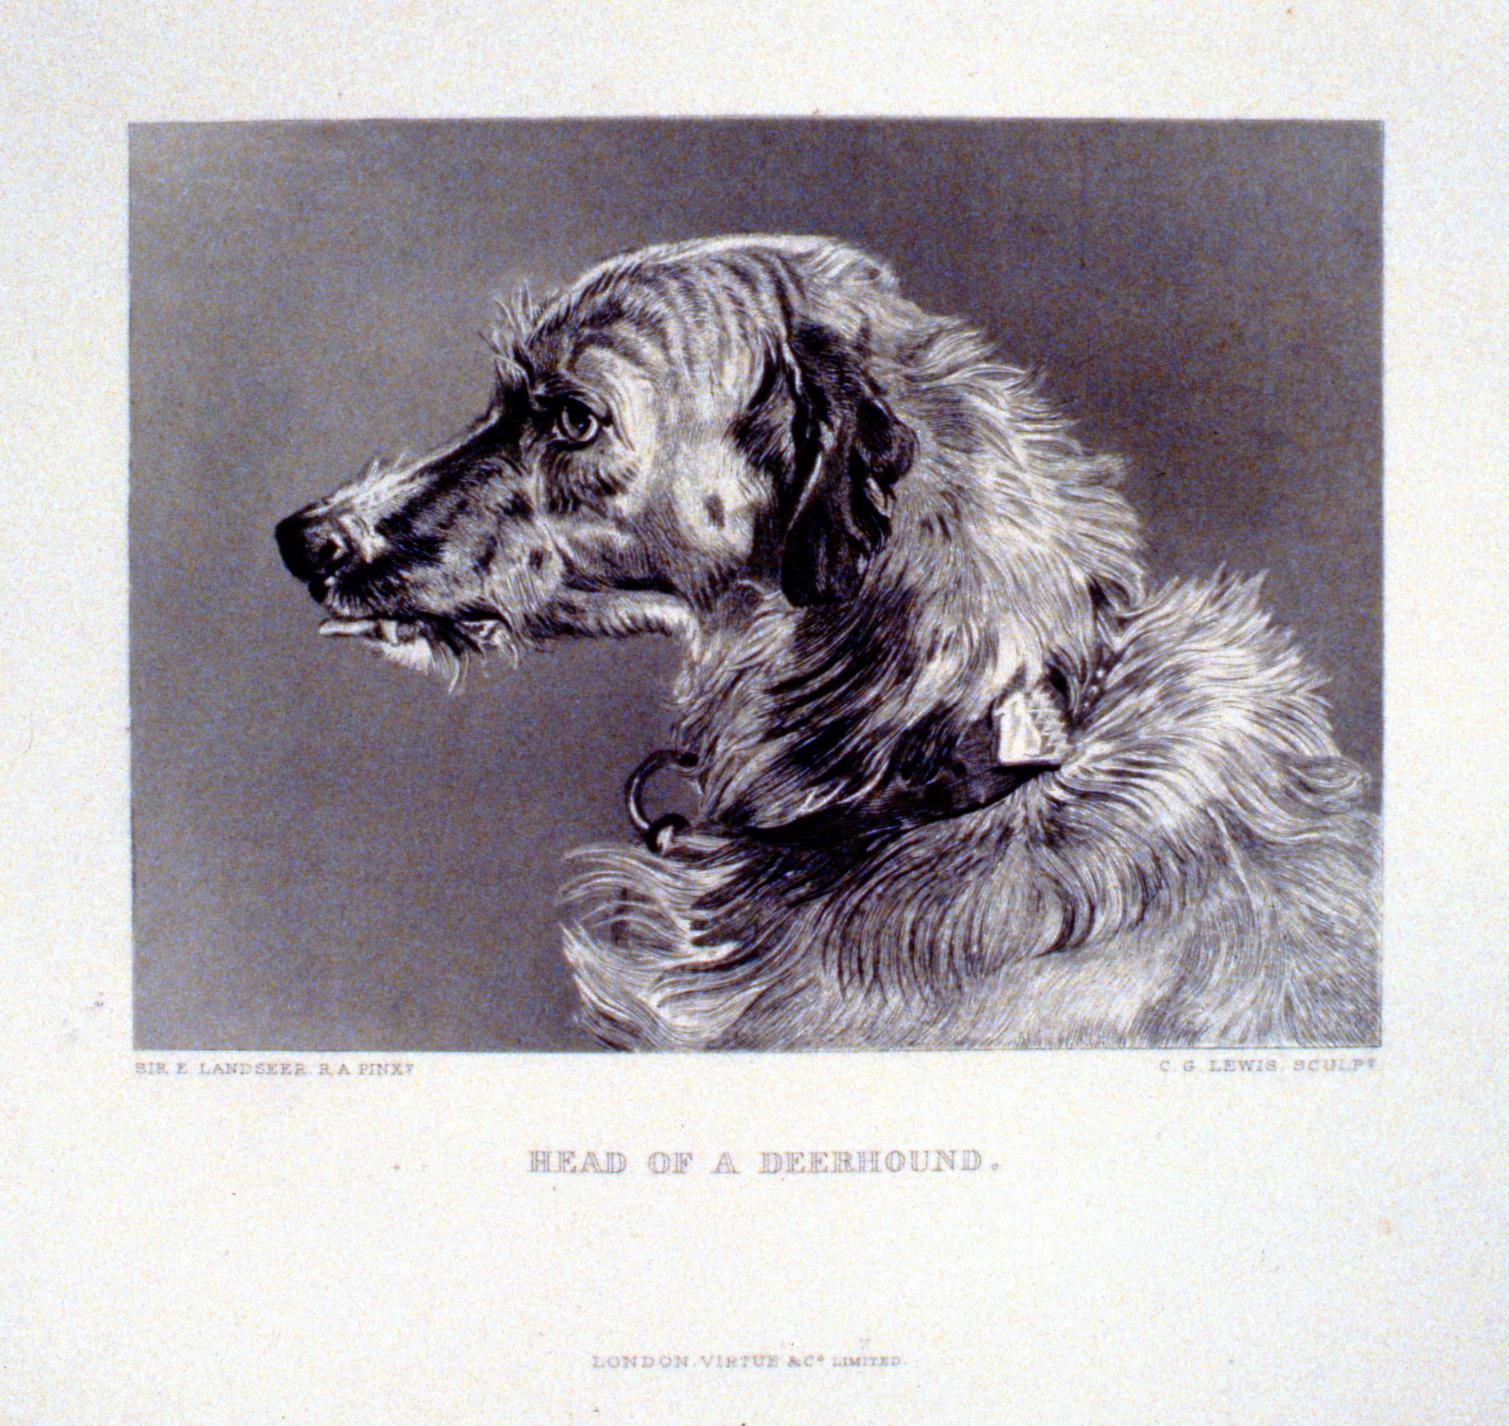 Head of a Deerhound , c. late 19th Century, Charles G. Lewis, steel engraving, 13.1 cm x 17.7 cm, 1996.08.20, gift of Yvonne Adams